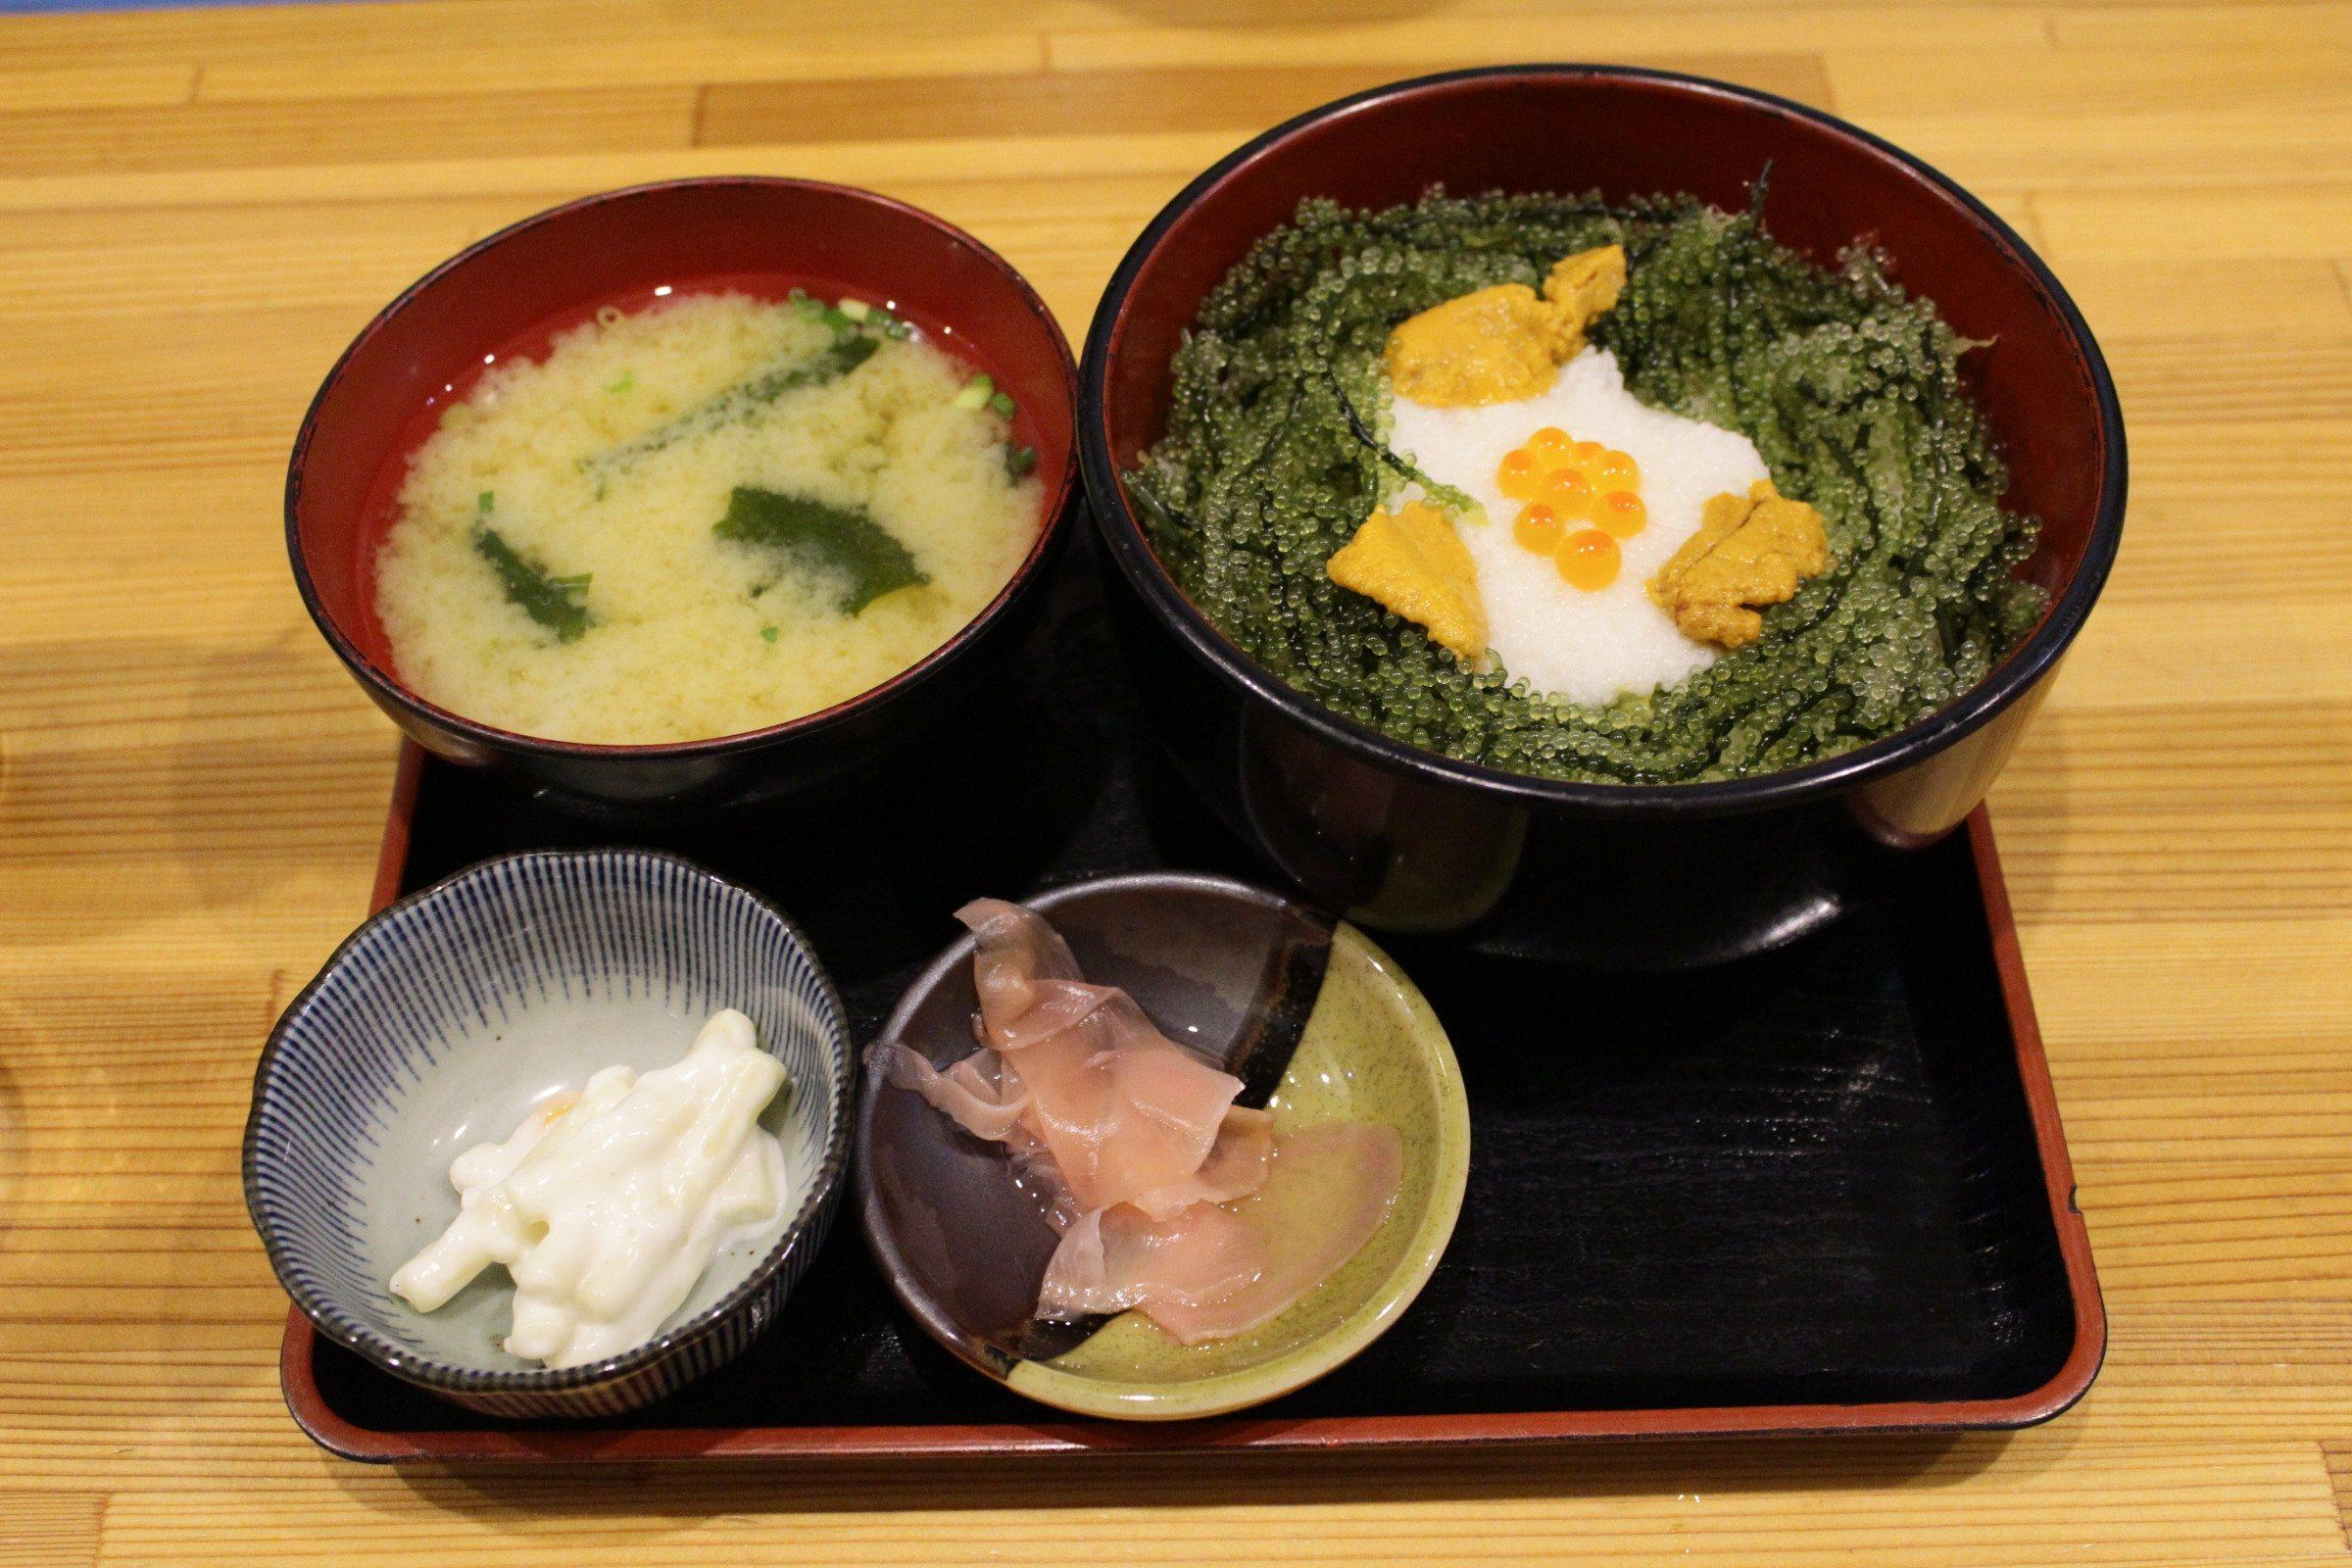 Umi Budou (the green stuff) with set menu